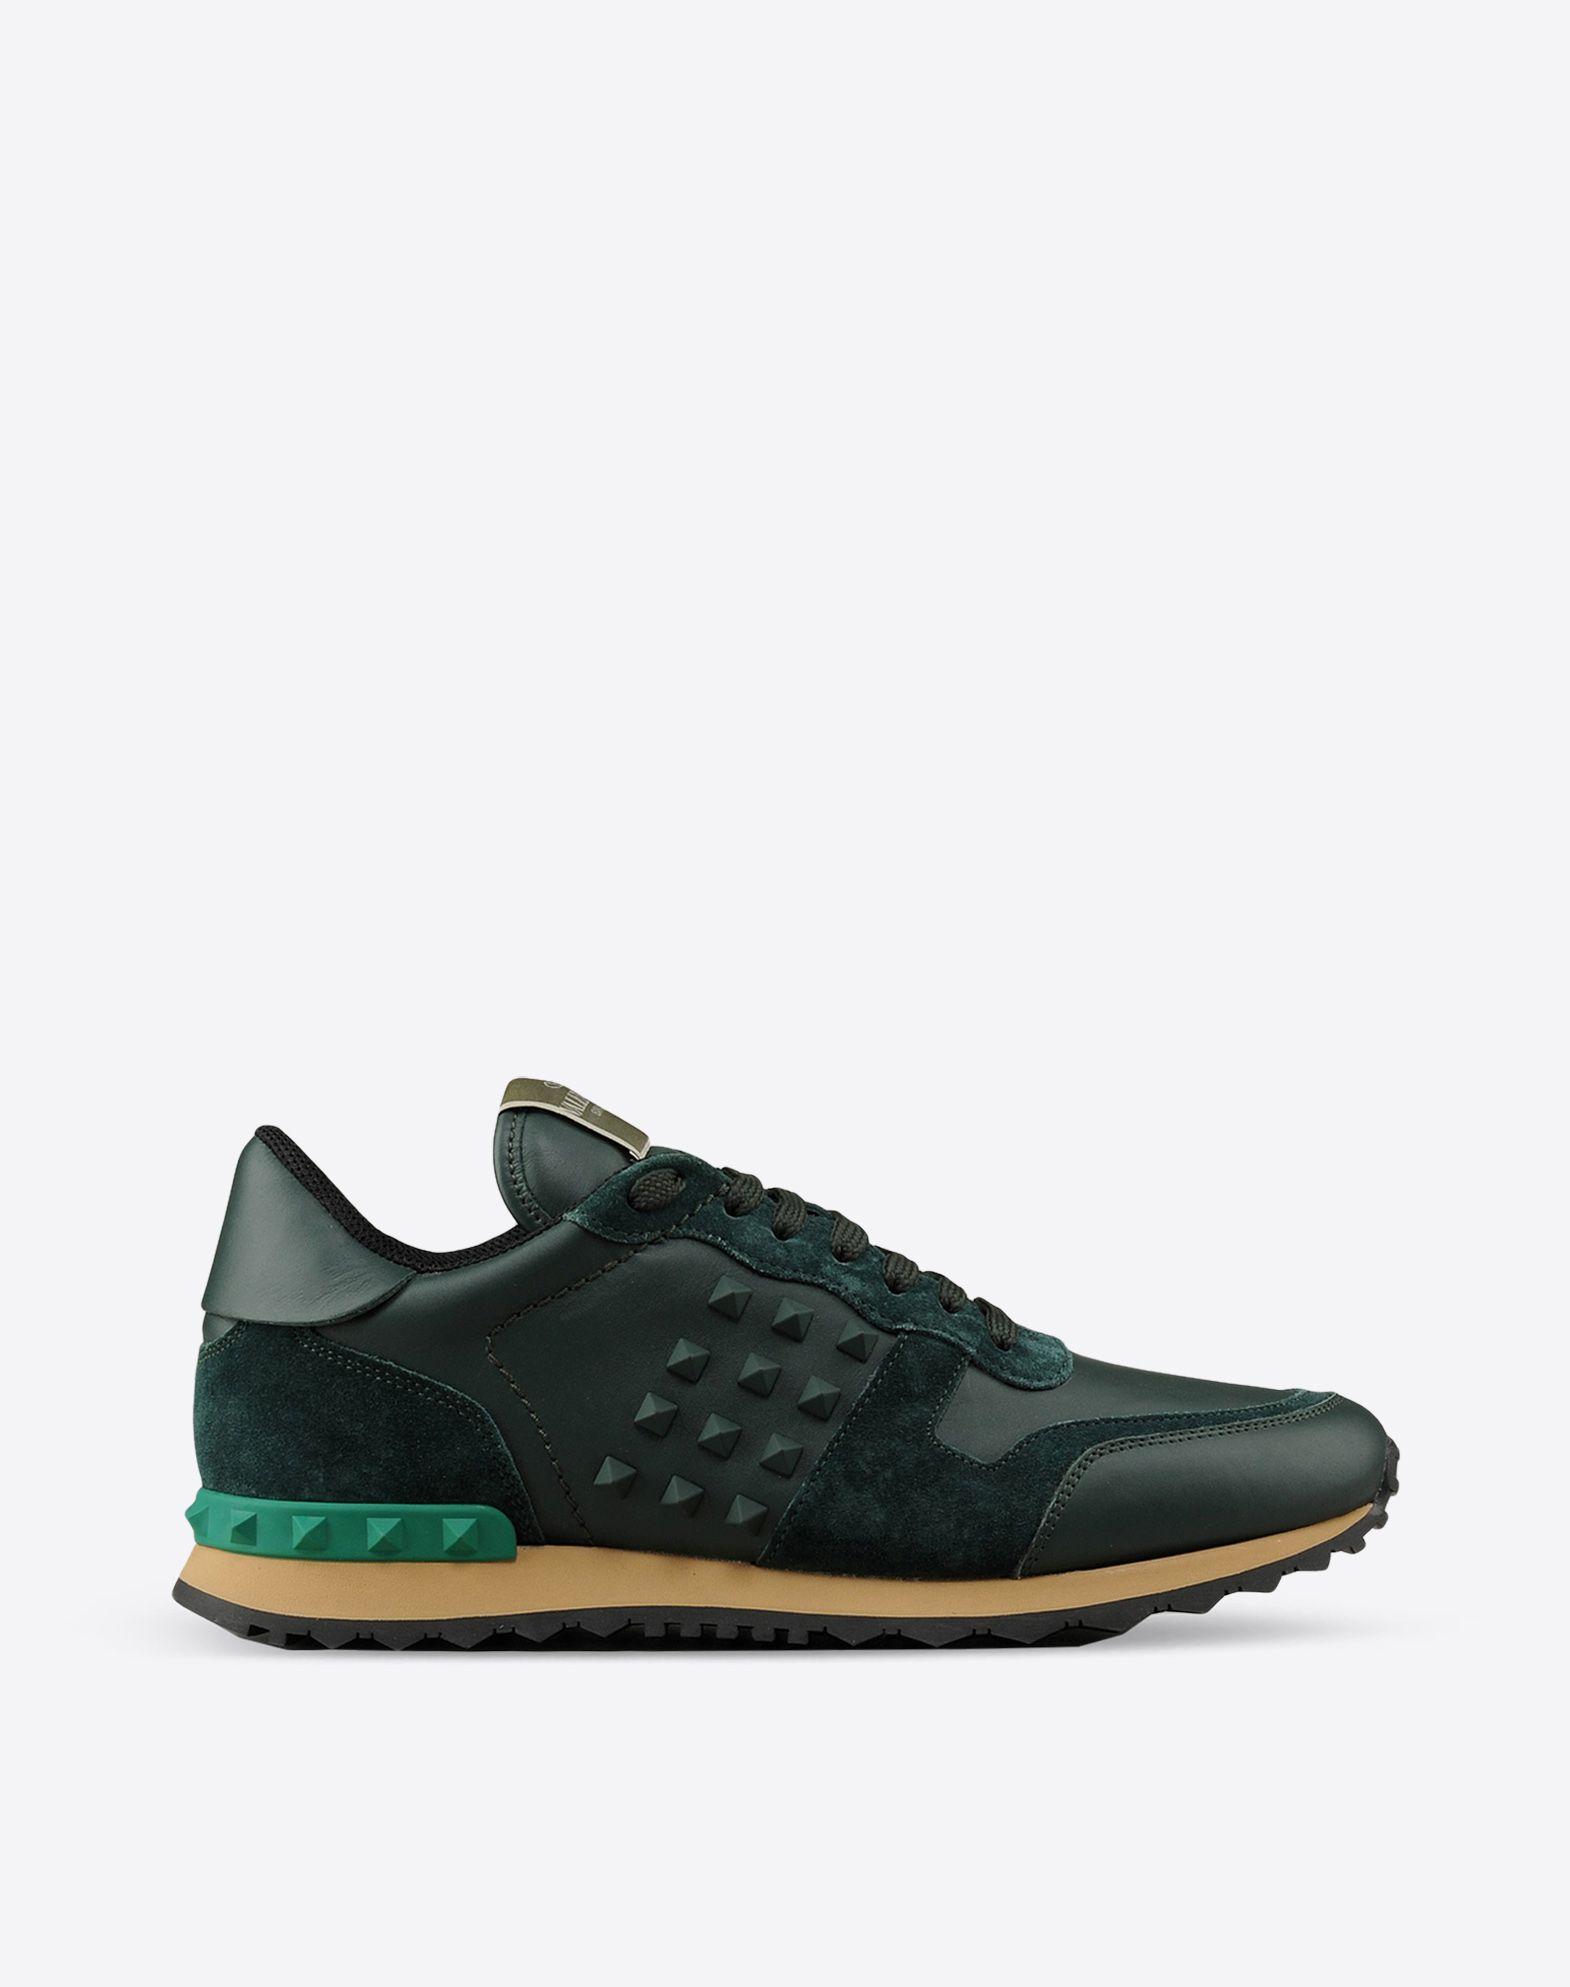 valentino garavani uomo rockstud sneaker sneakers for men valentino online boutique. Black Bedroom Furniture Sets. Home Design Ideas